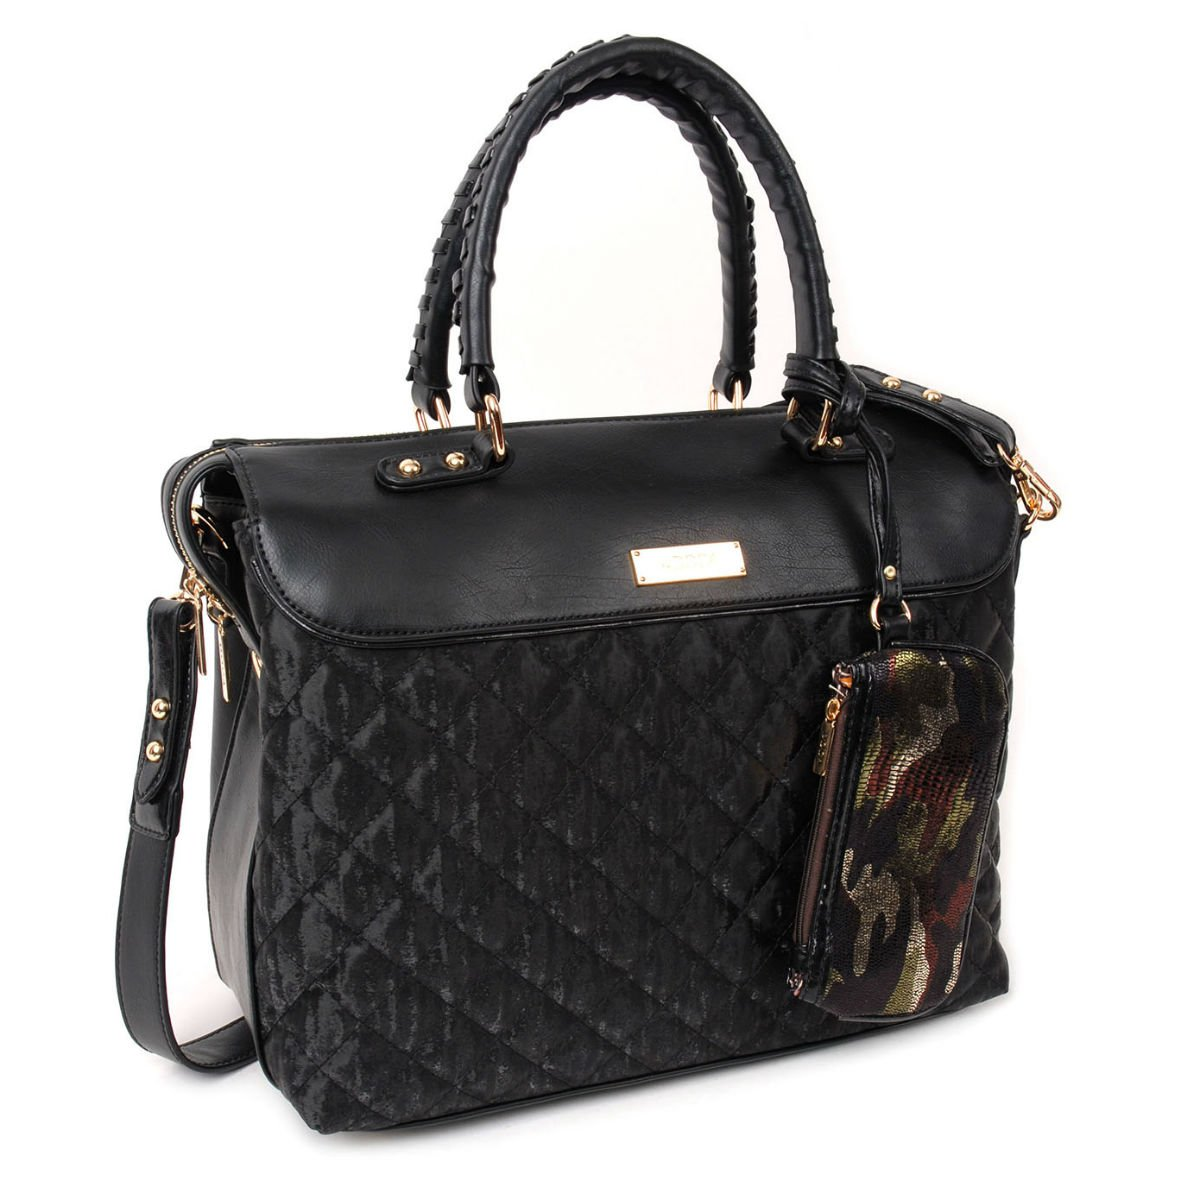 Černá kabelka DOCA - Beads